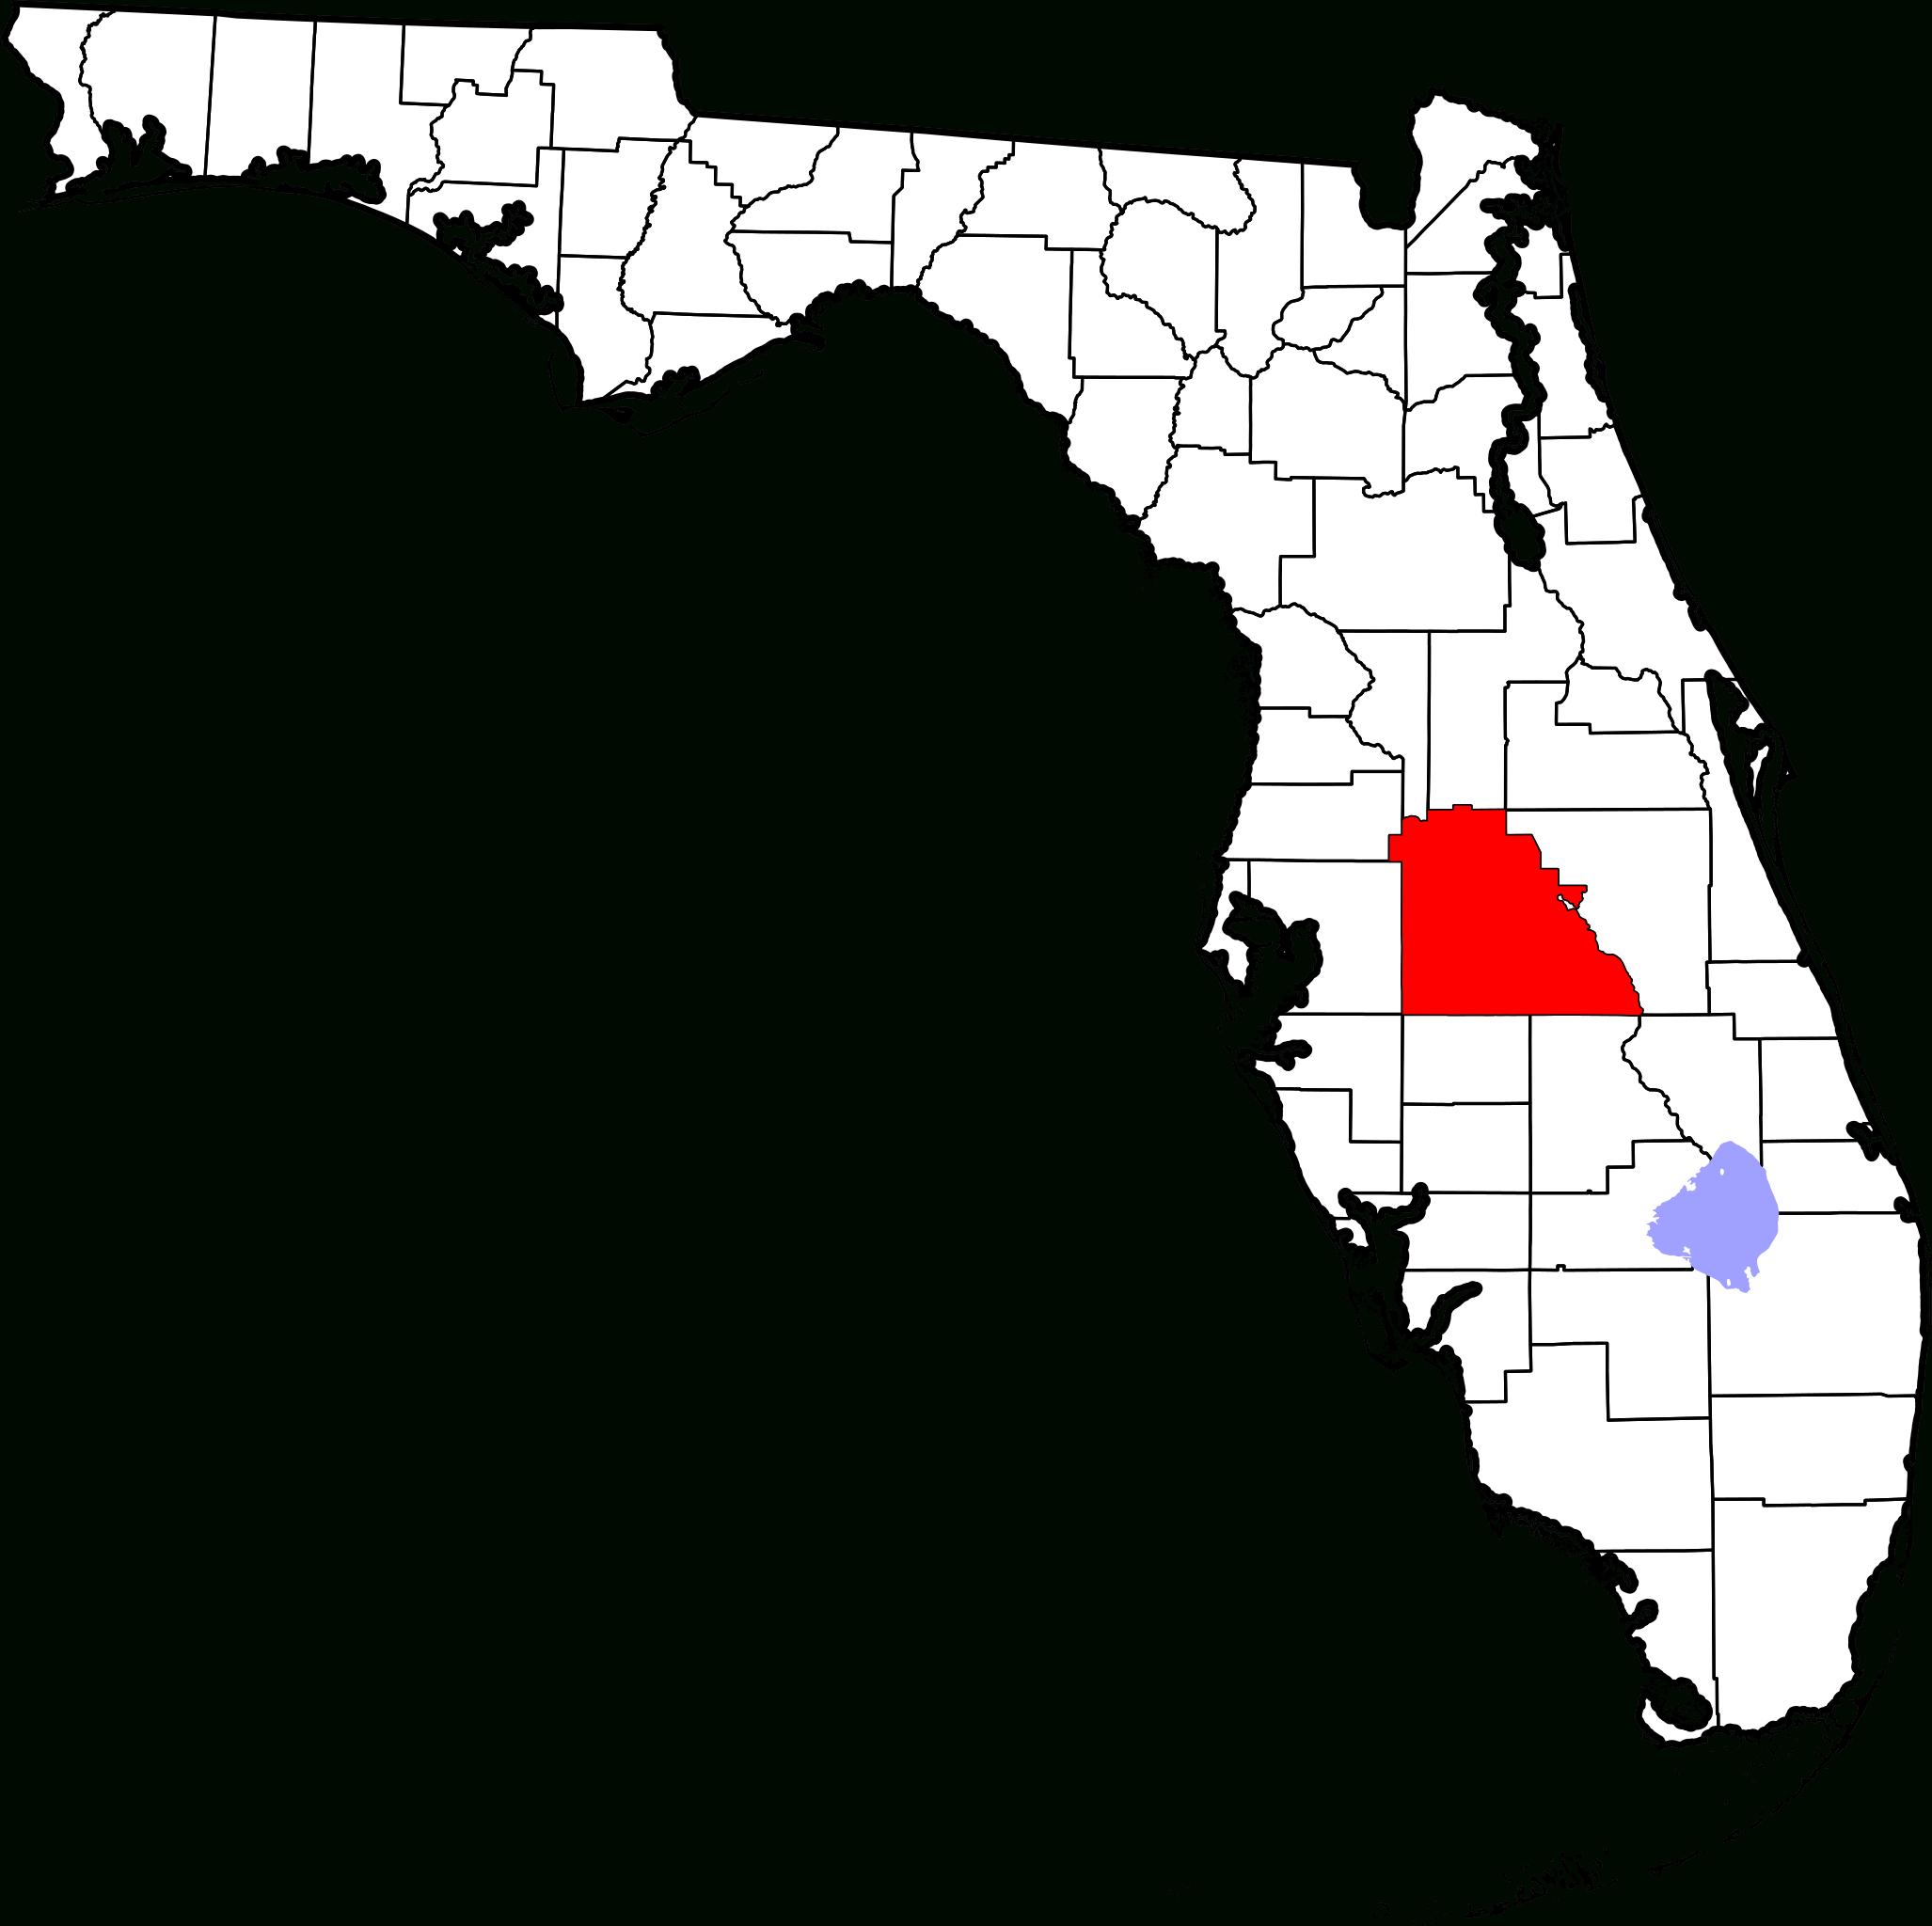 Fichier:map Of Florida Highlighting Polk County.svg — Wikipédia - Frostproof Florida Map